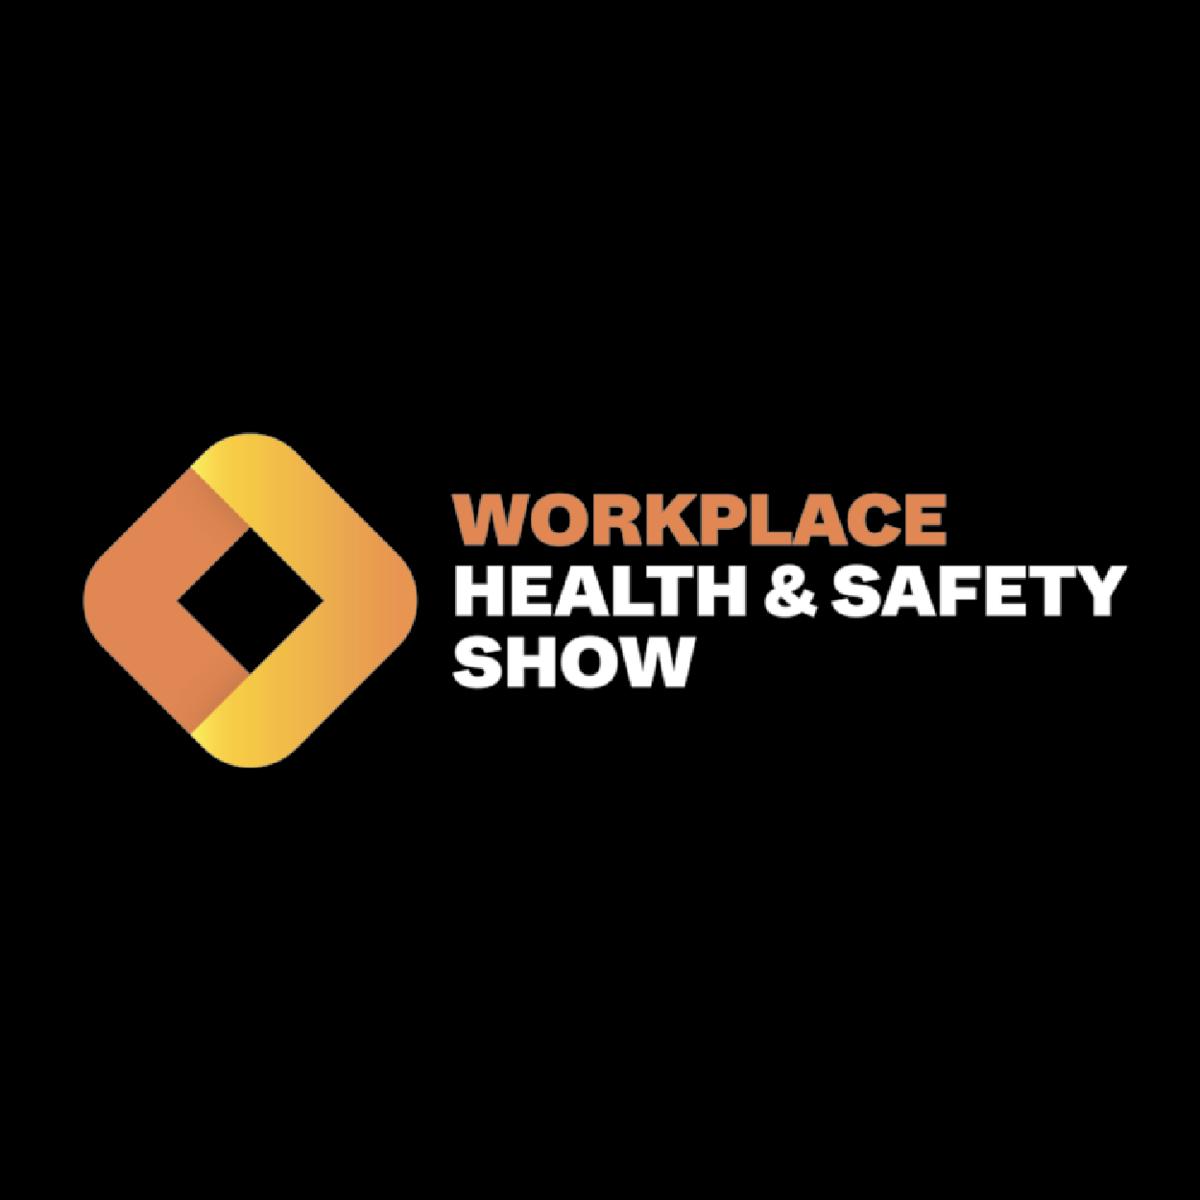 Workplace Health & Safety Show - Sydney